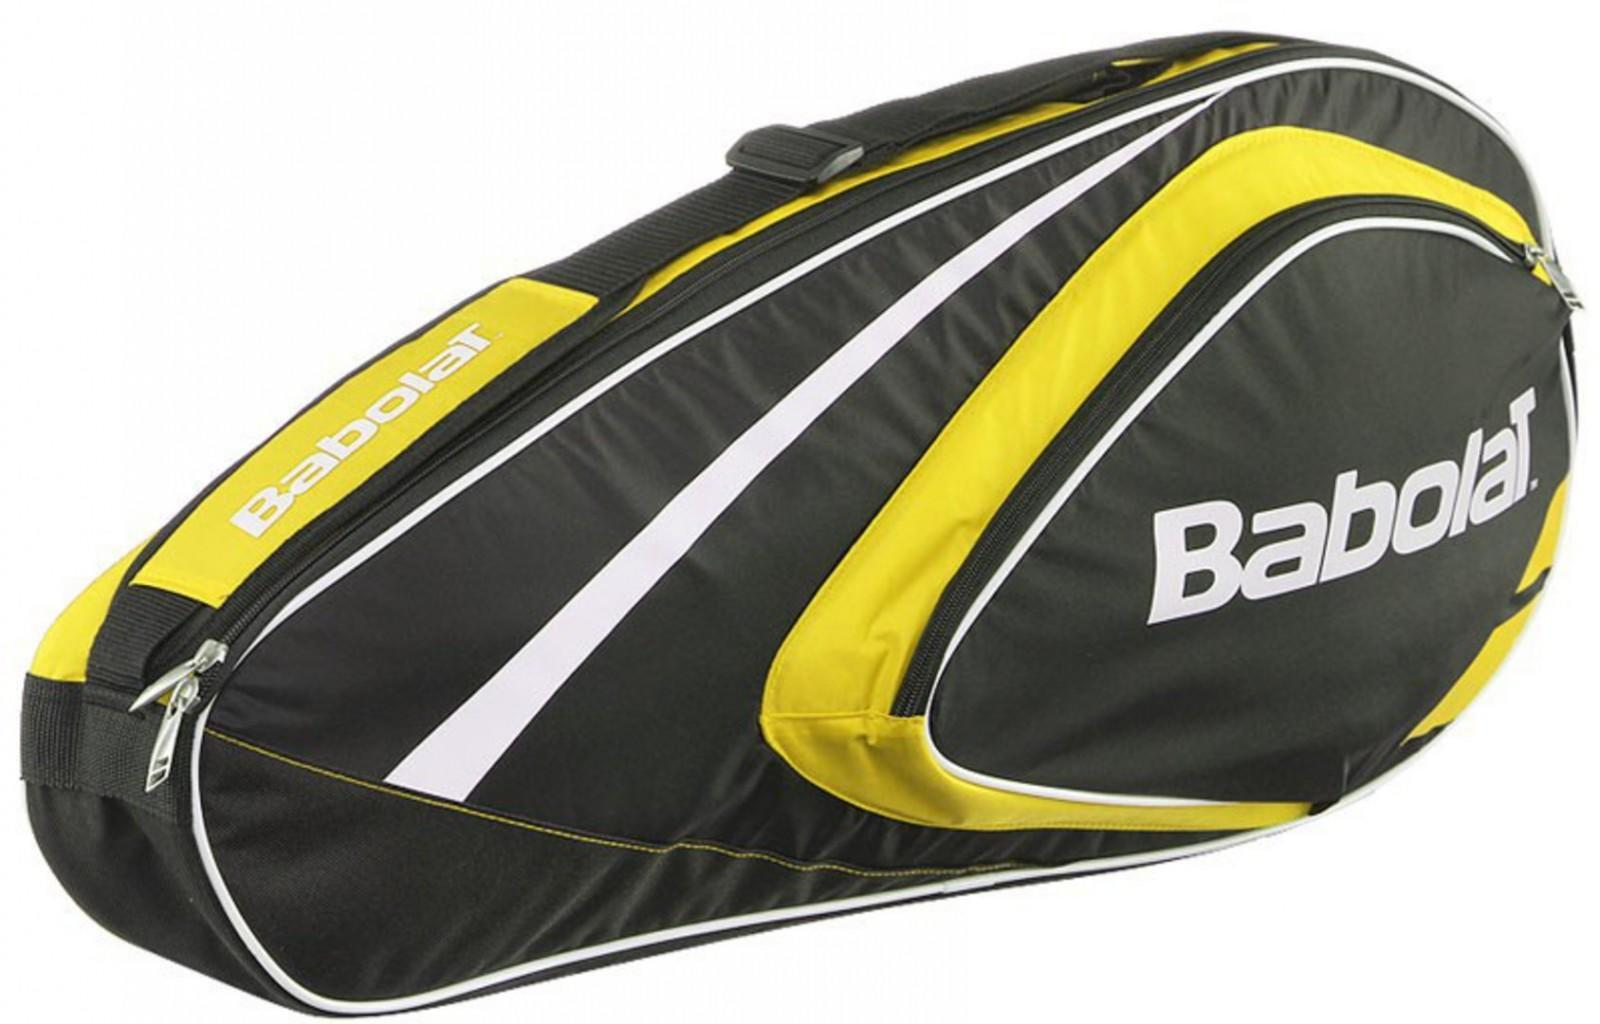 Теннисная сумка Babolat Club Line x3 yellow